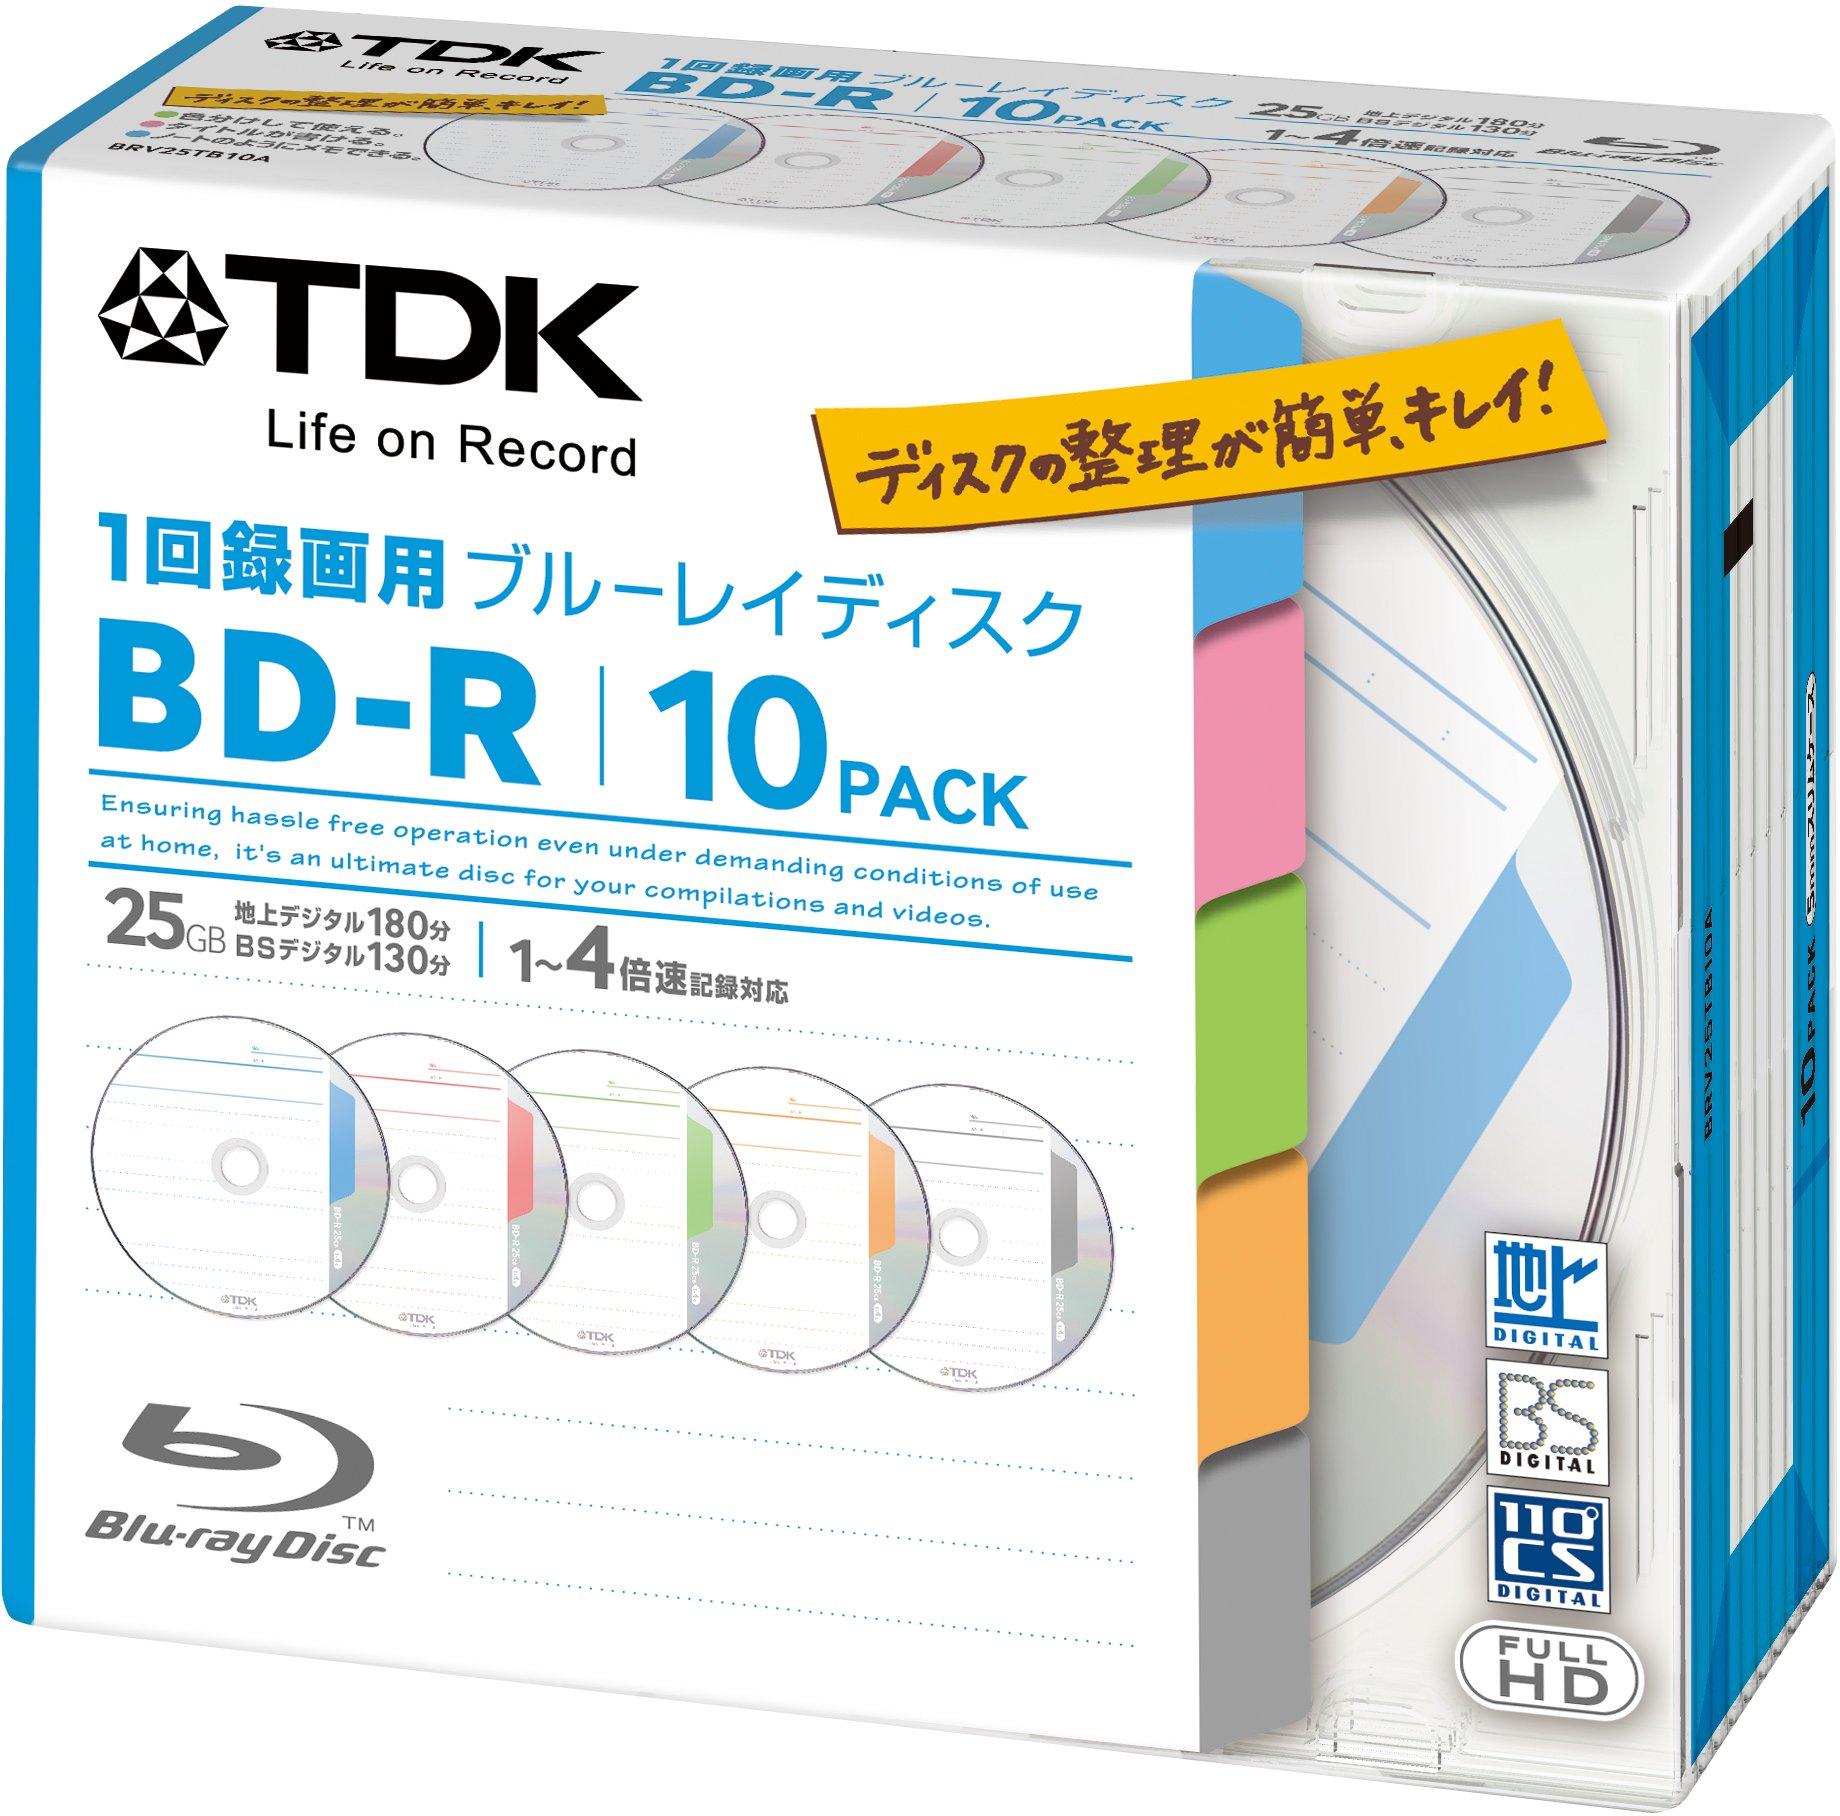 TDK Bluray Disc 25 gb BD-R 4x Index Series HD Discs 10 Pack in Jewel Cases